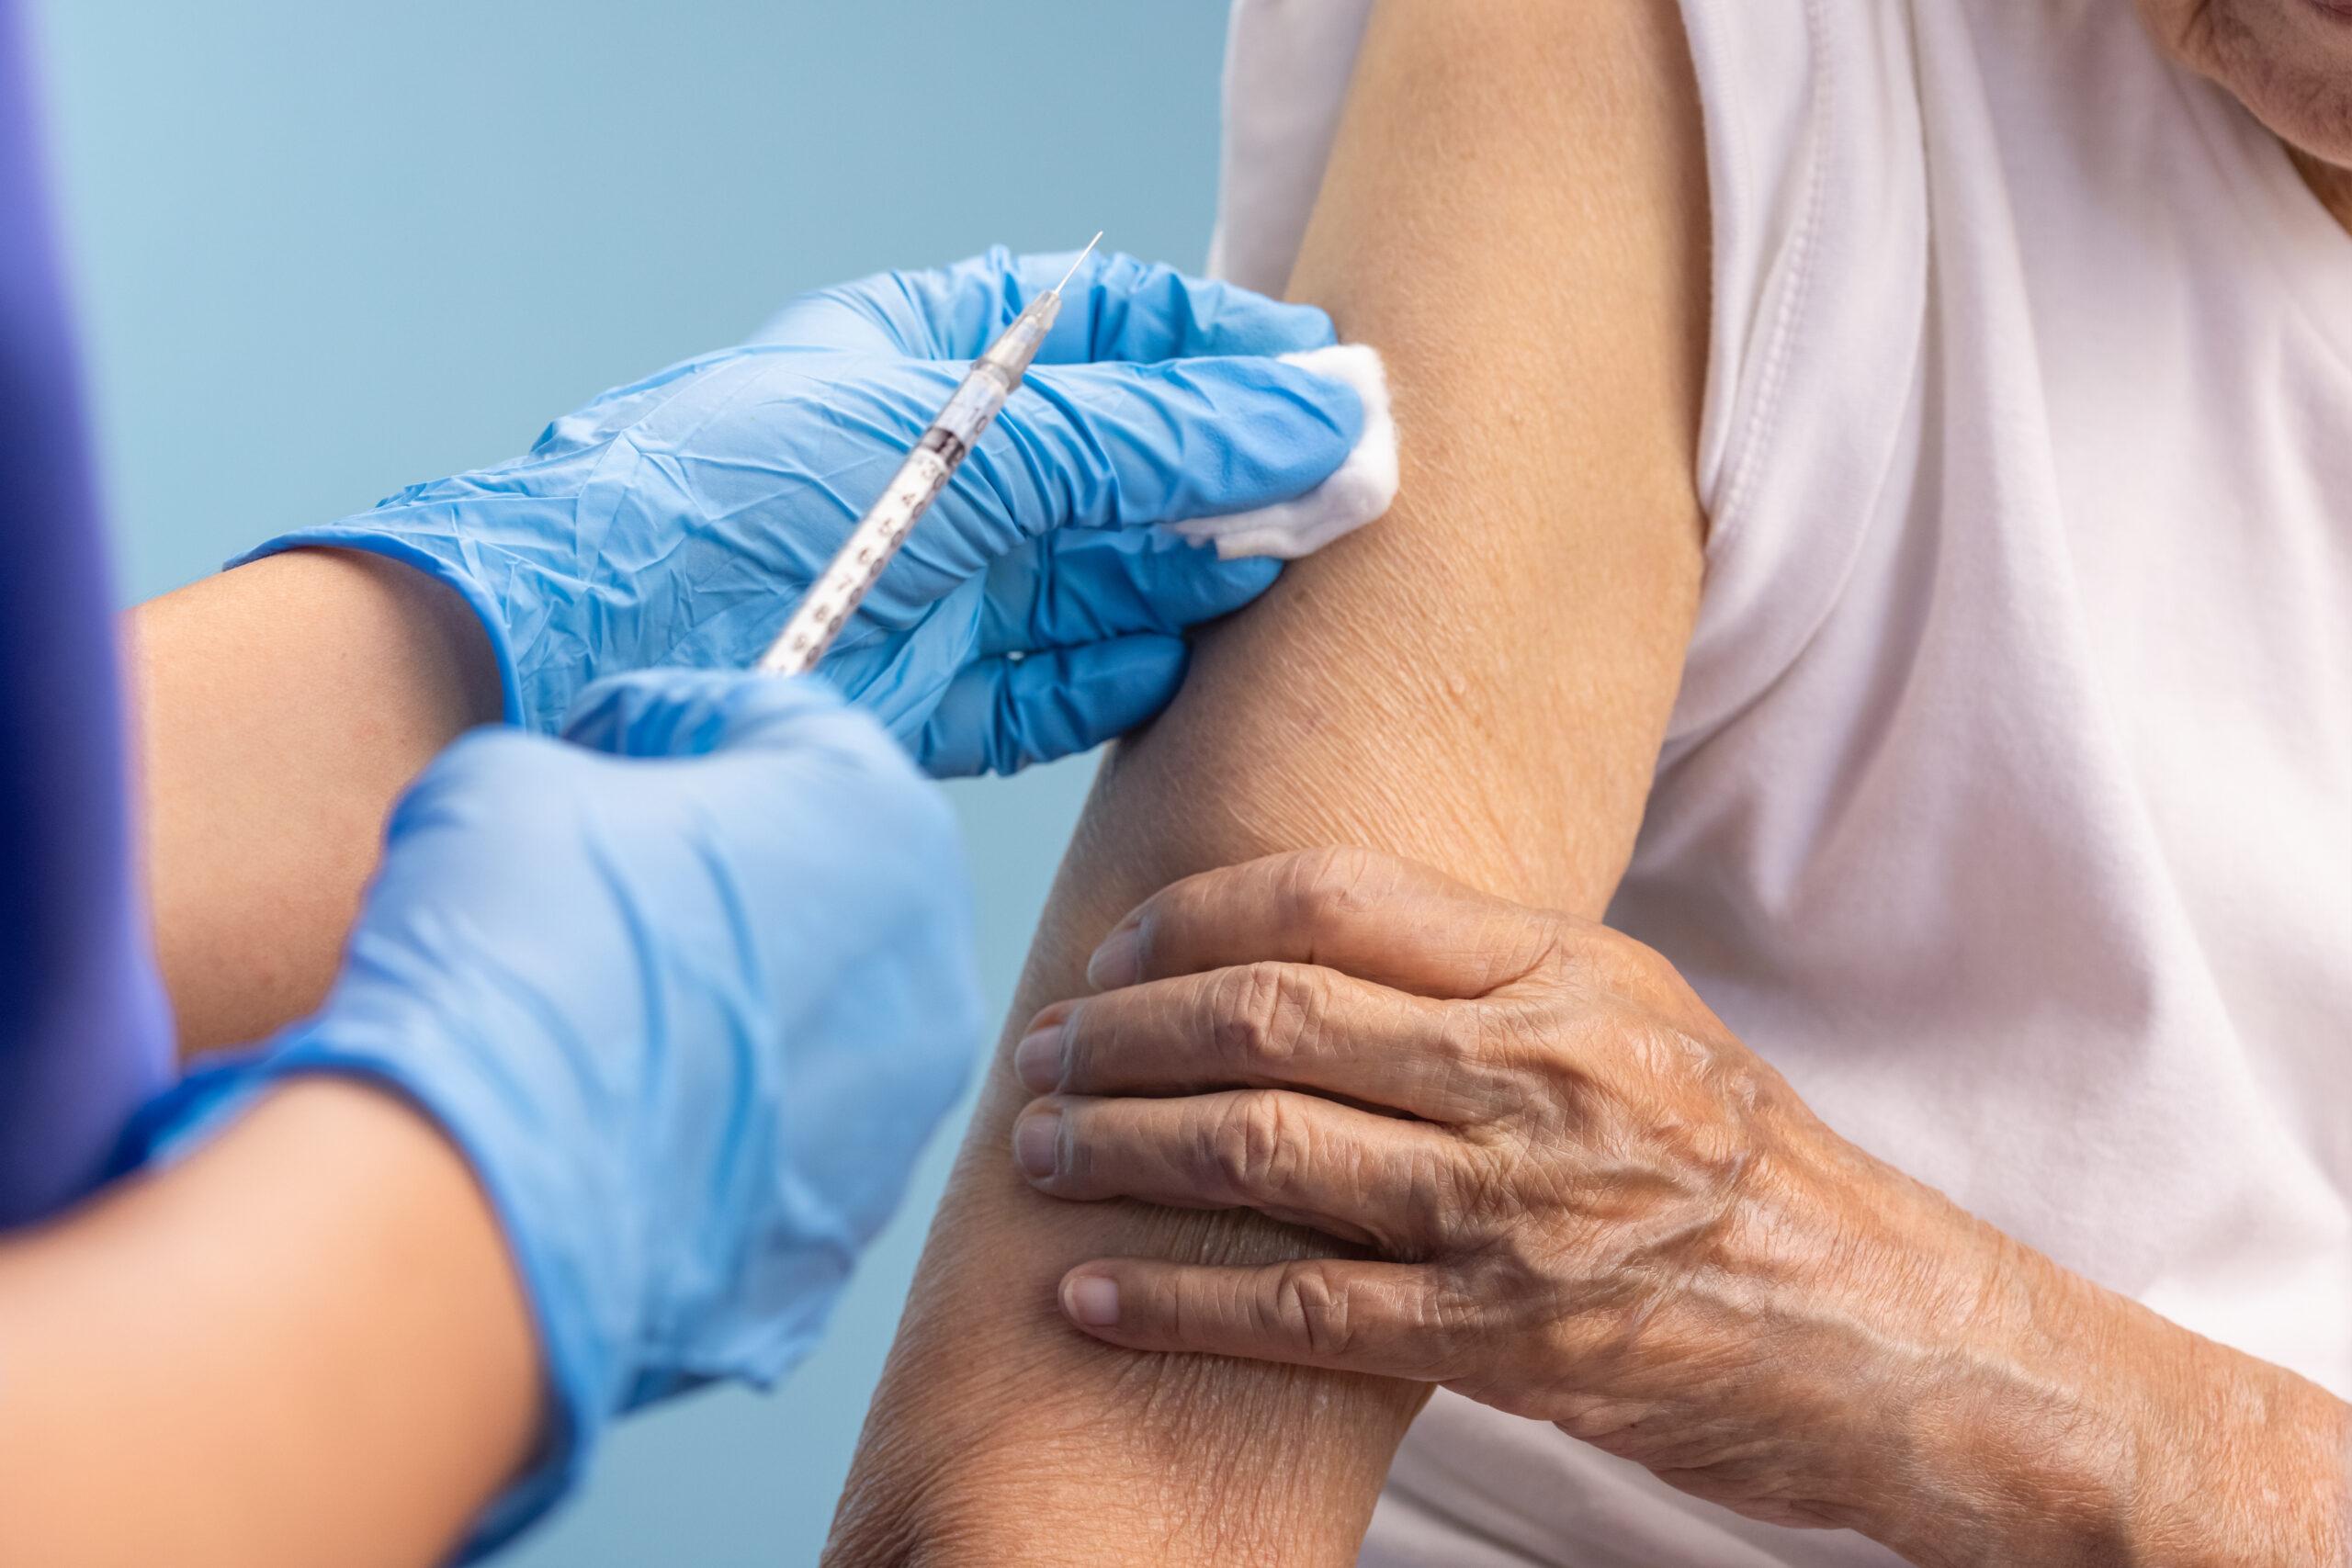 KZN Health MEC urges elderly to get COVID-19 jabs.